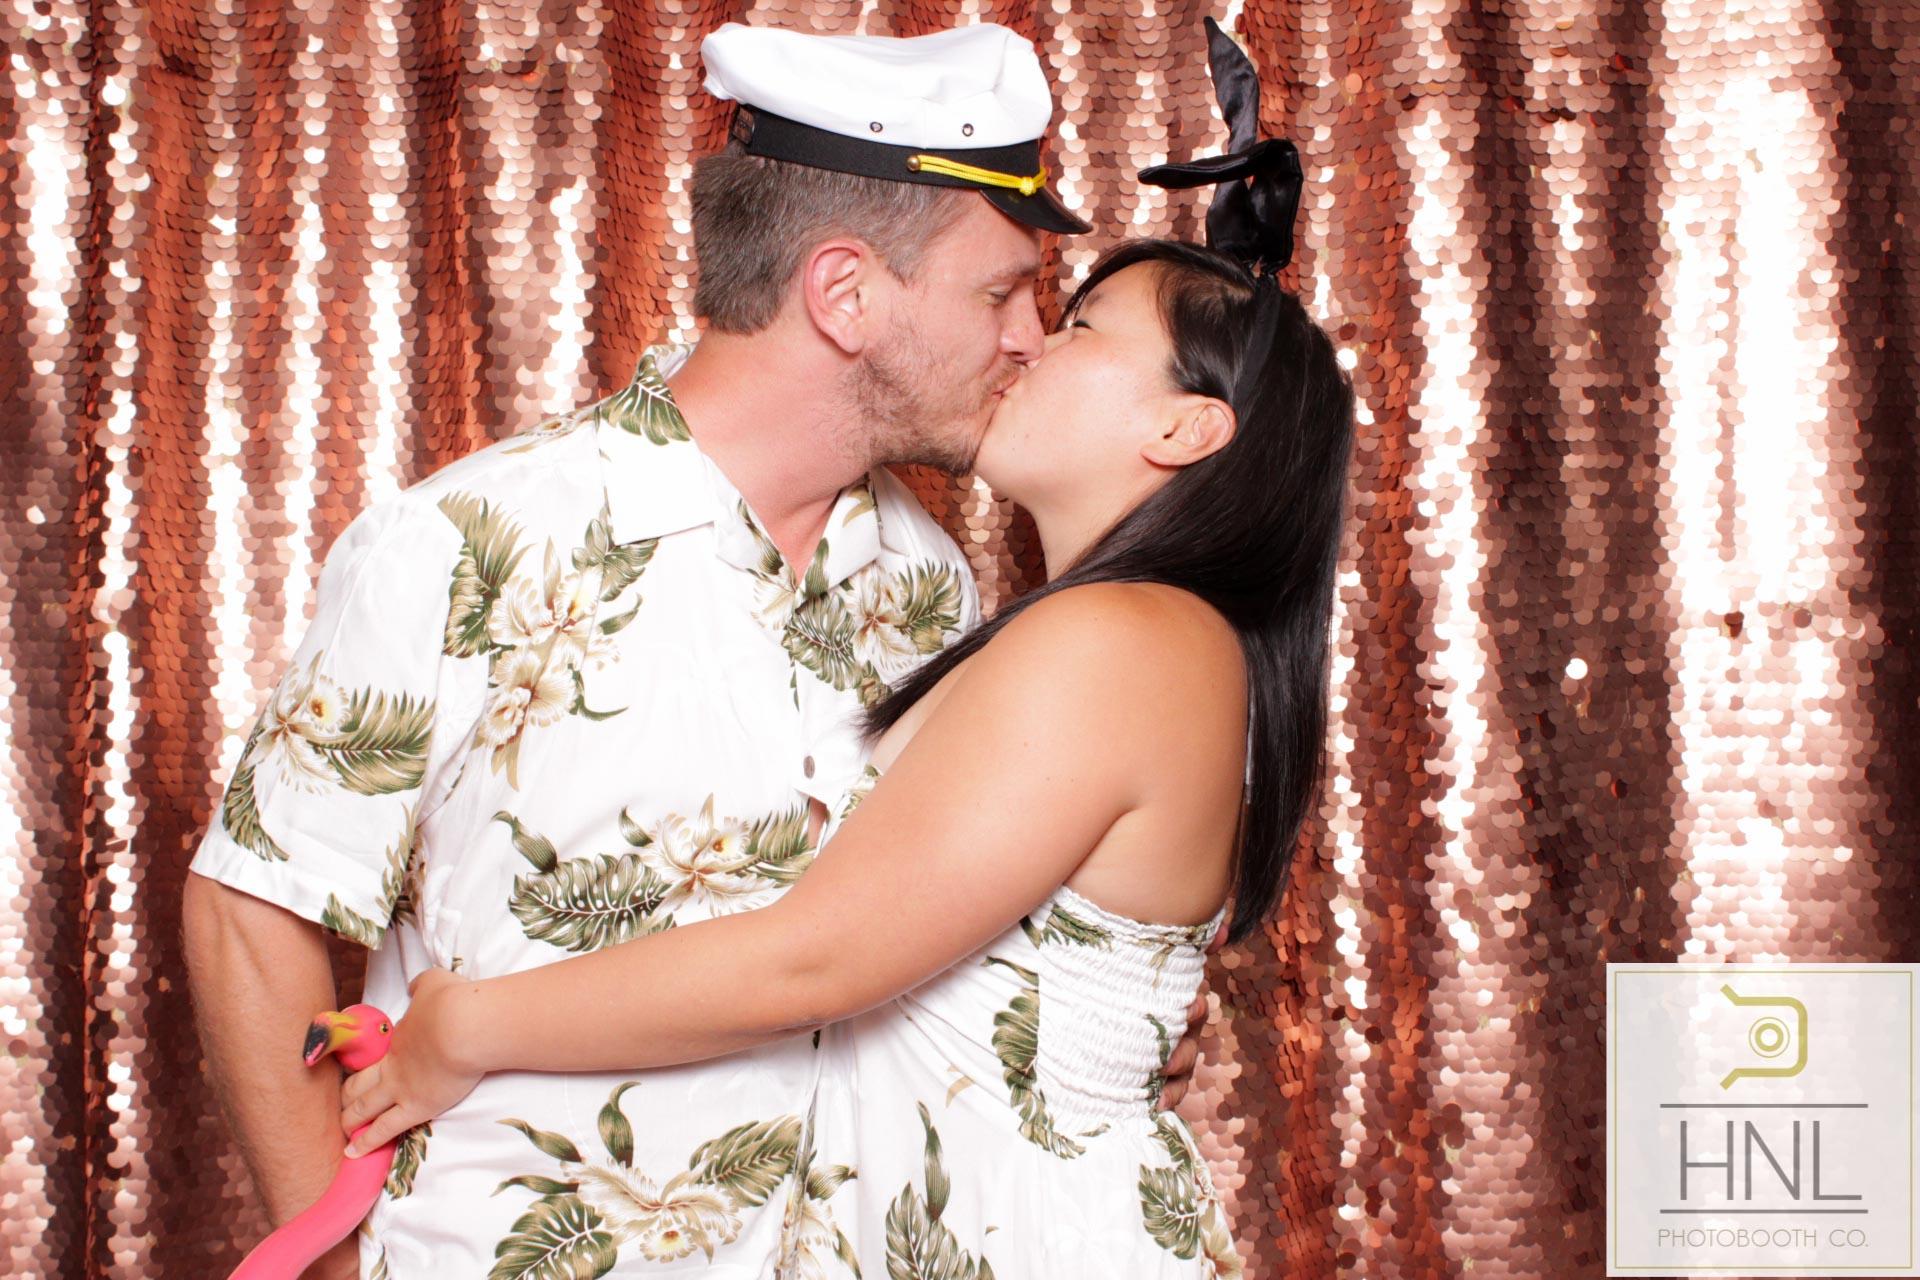 Robert and Cindy Wedding Waialae Country Club Oahu Honolulu Hawaii (28 of 148).jpg